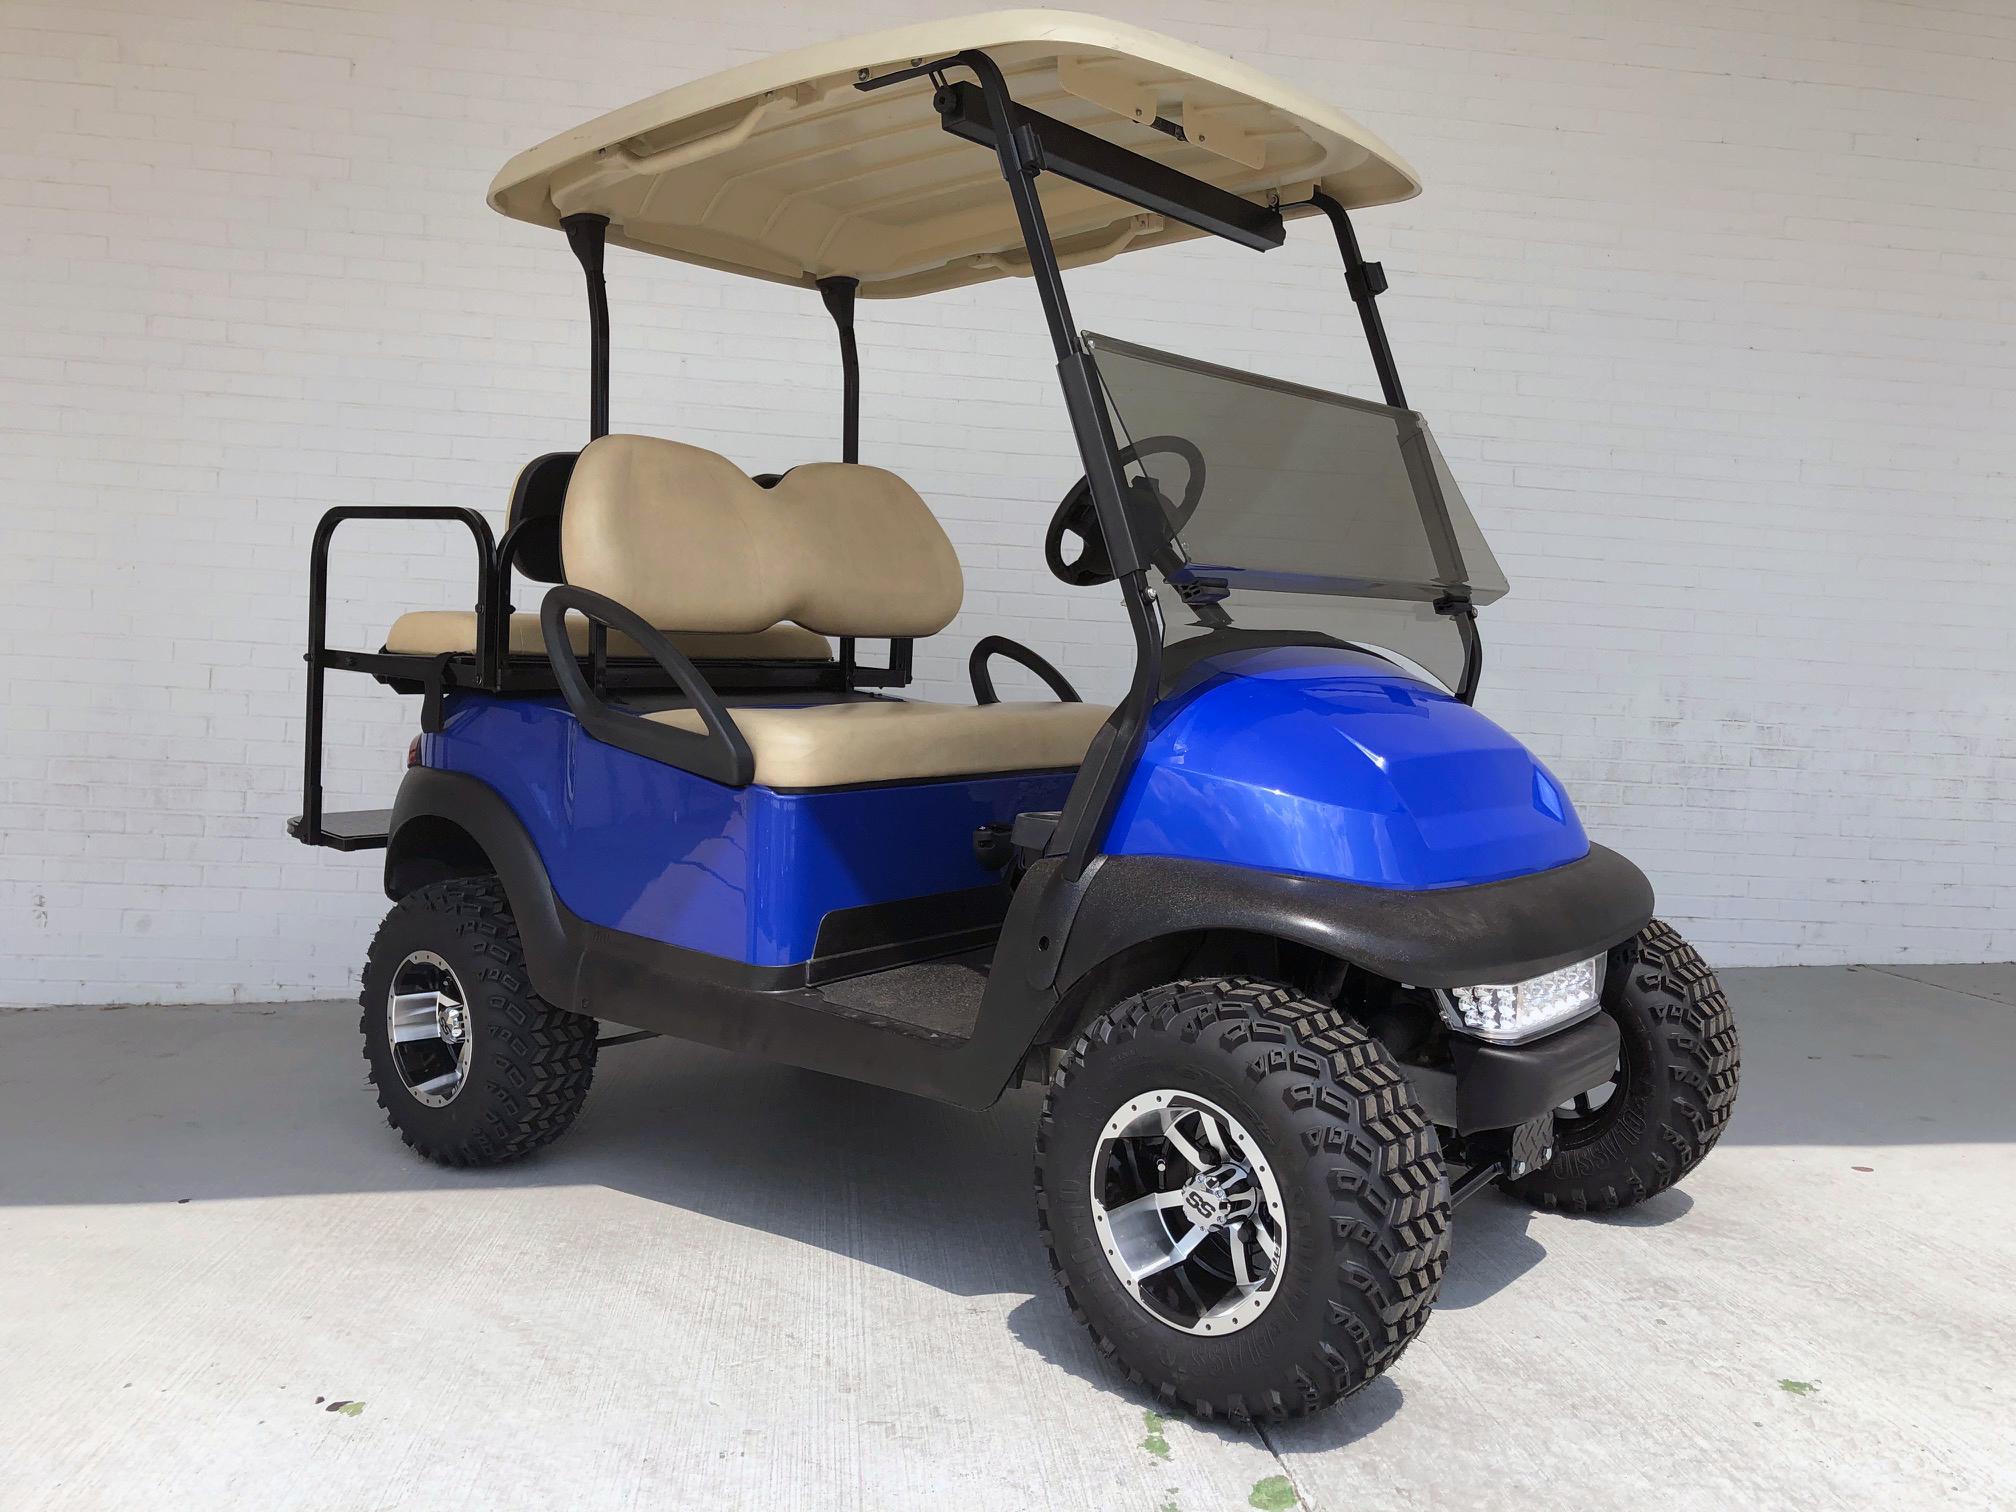 Blue 4 Inch Lifted Club Car Golf Cart | Golf Carts - Lifted